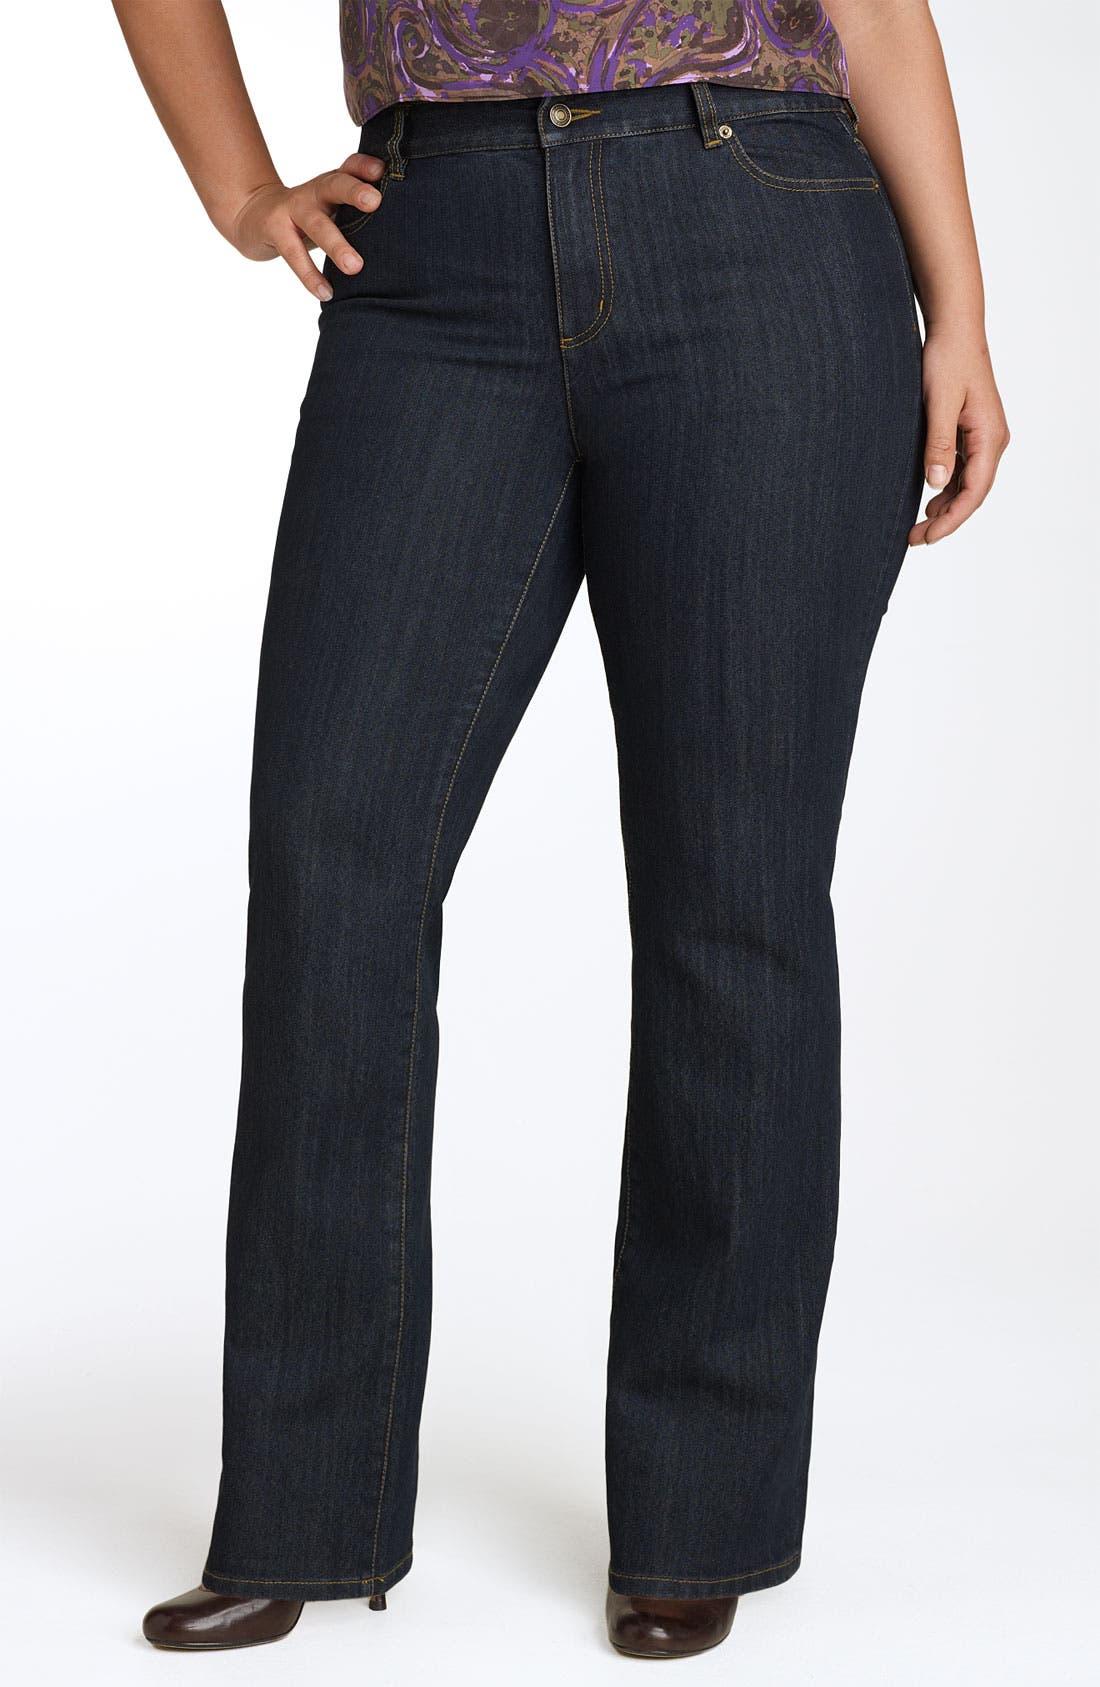 Michael kors plus size bootcut jeans